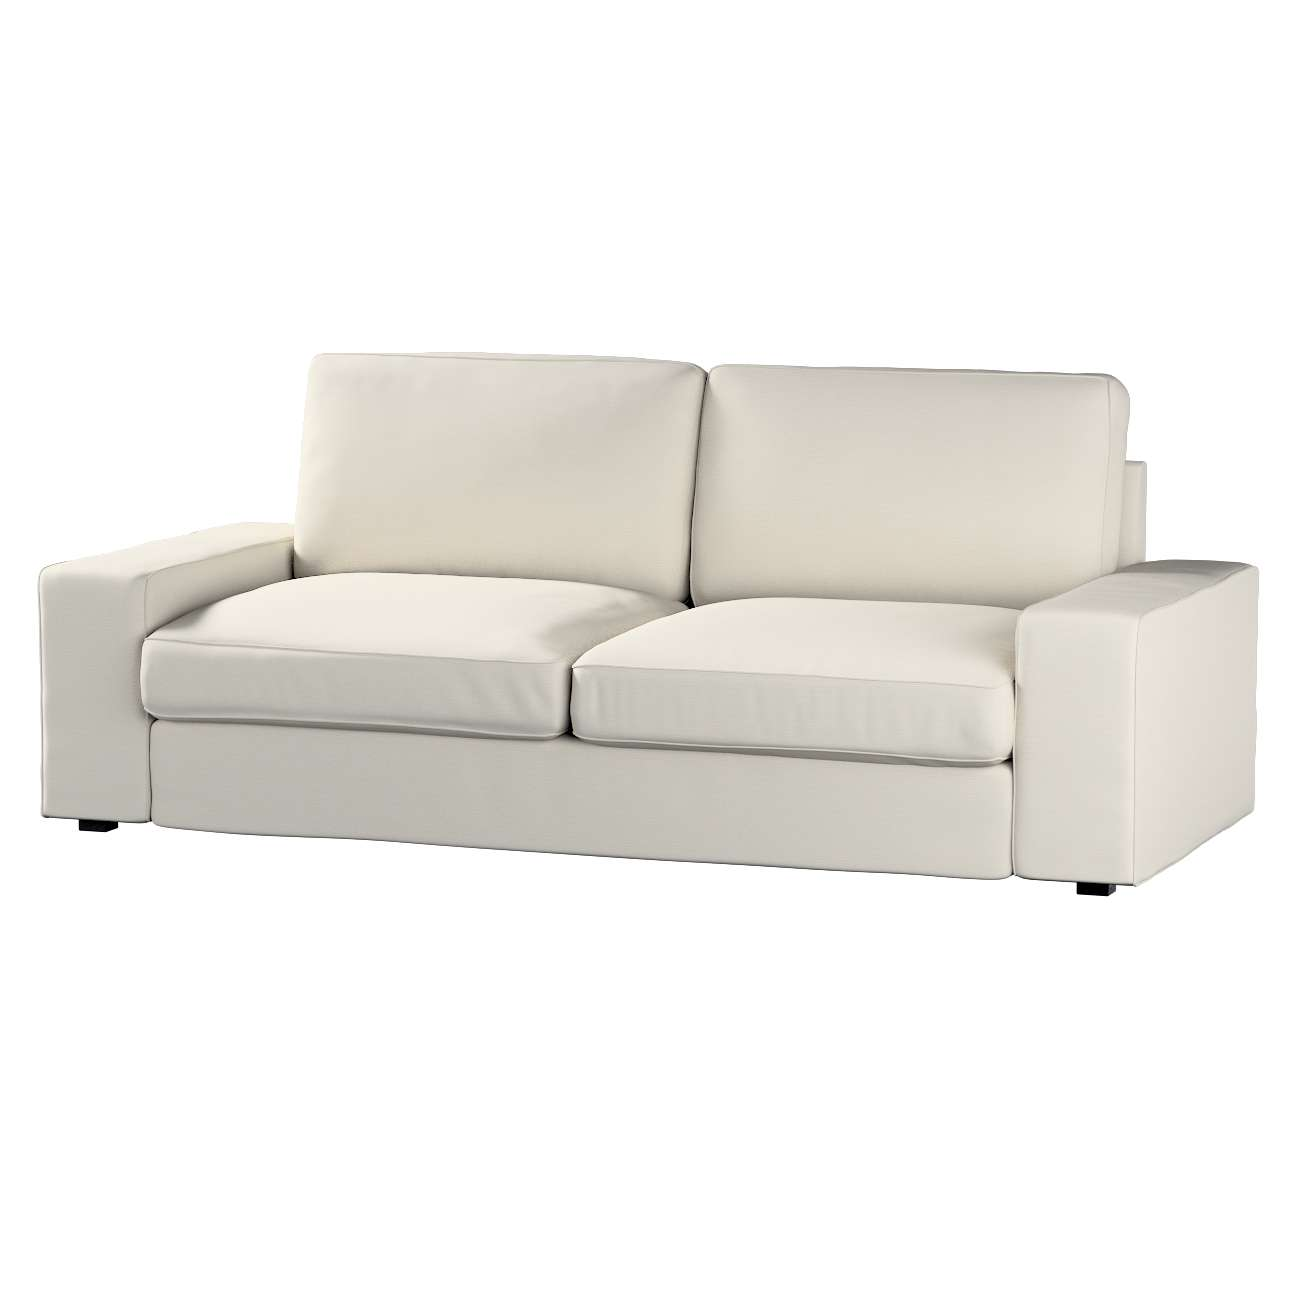 Kivik 3-er Bettsofabezug Kivik 3-er Bettsofabezug von der Kollektion Cotton Panama, Stoff: 702-31